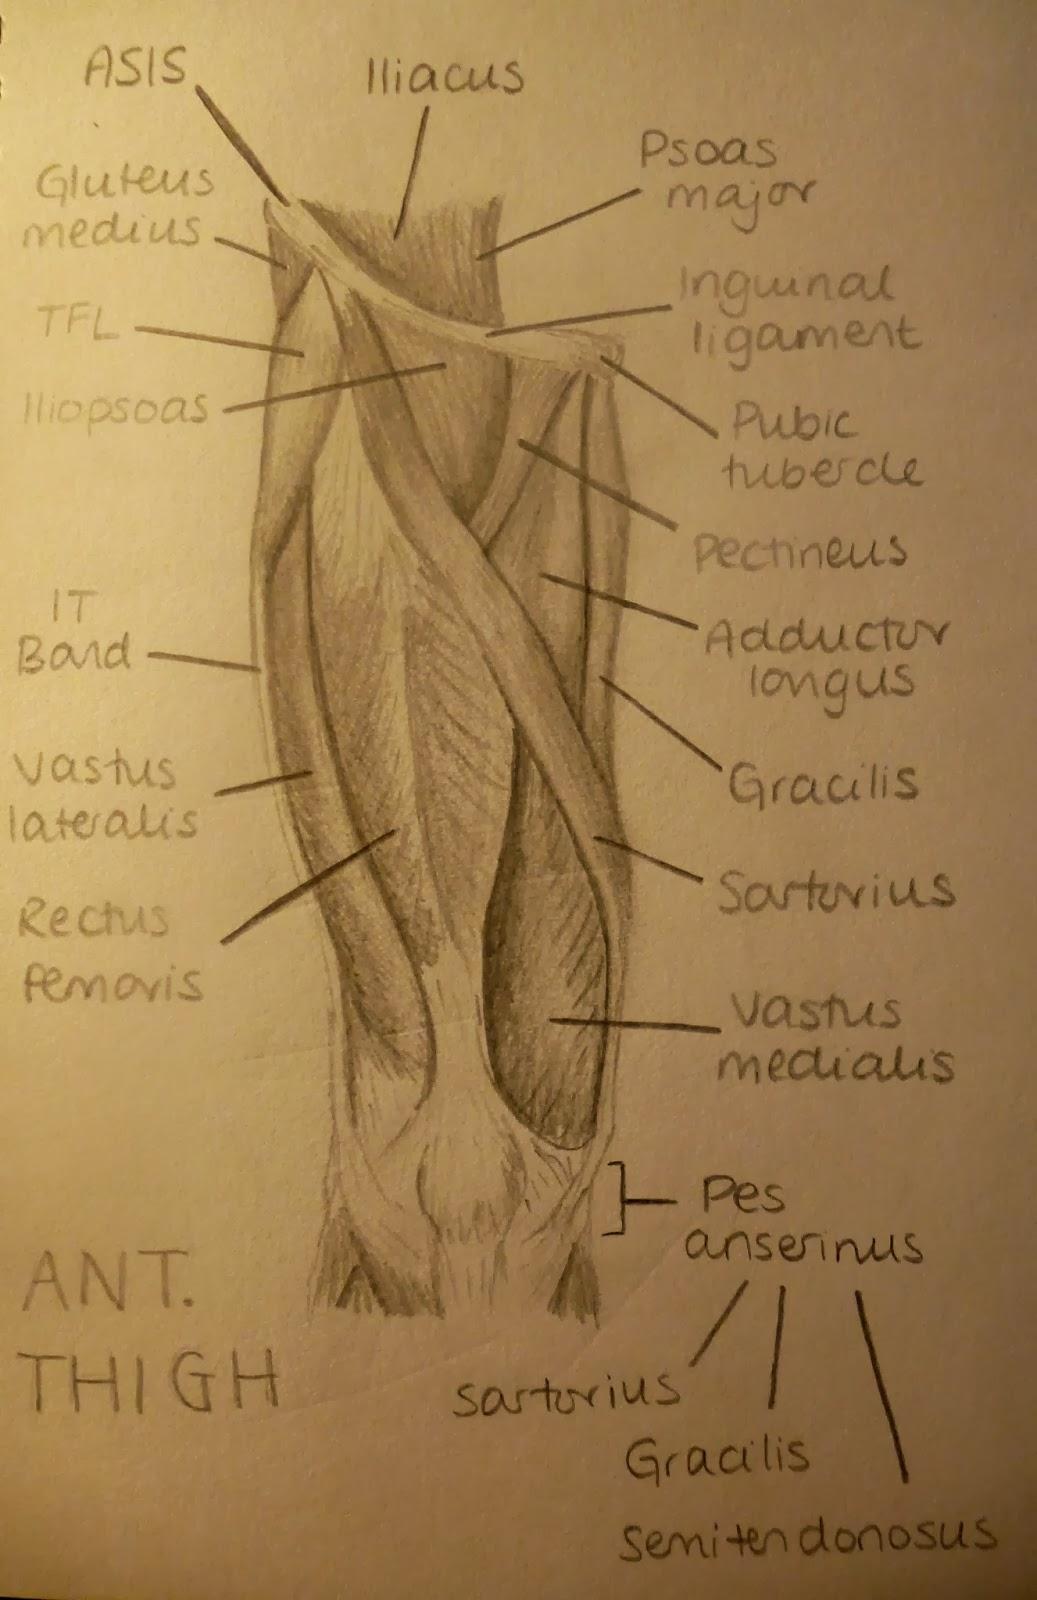 Ant. Thigh